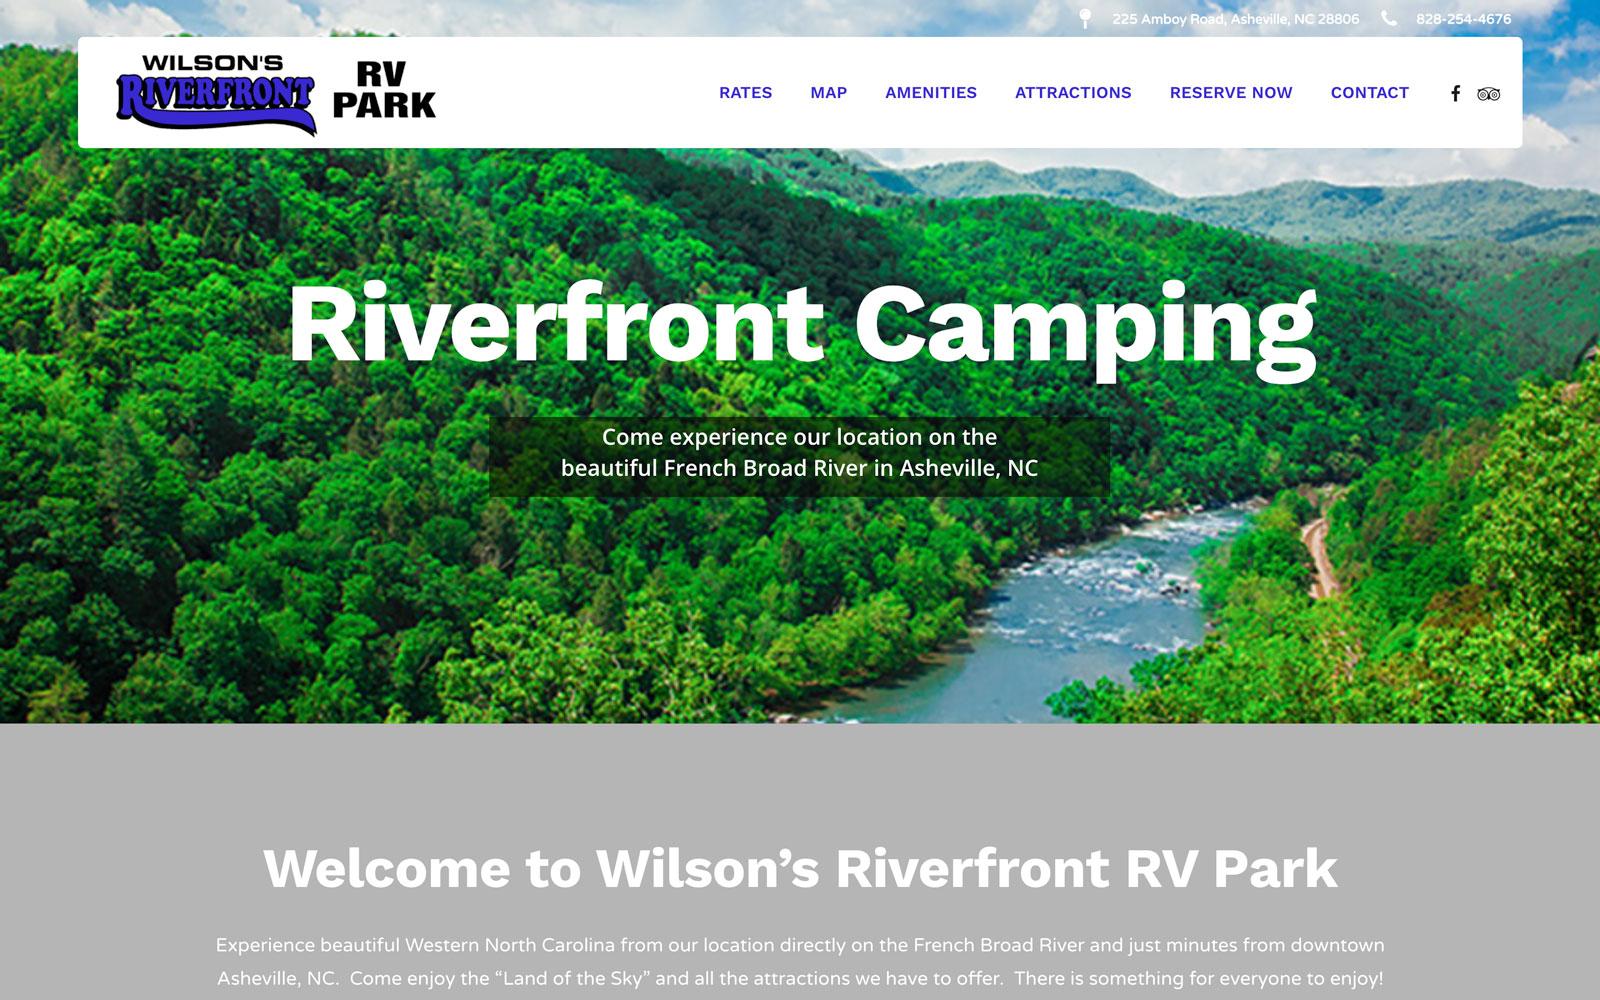 Wilson's RV Park Website